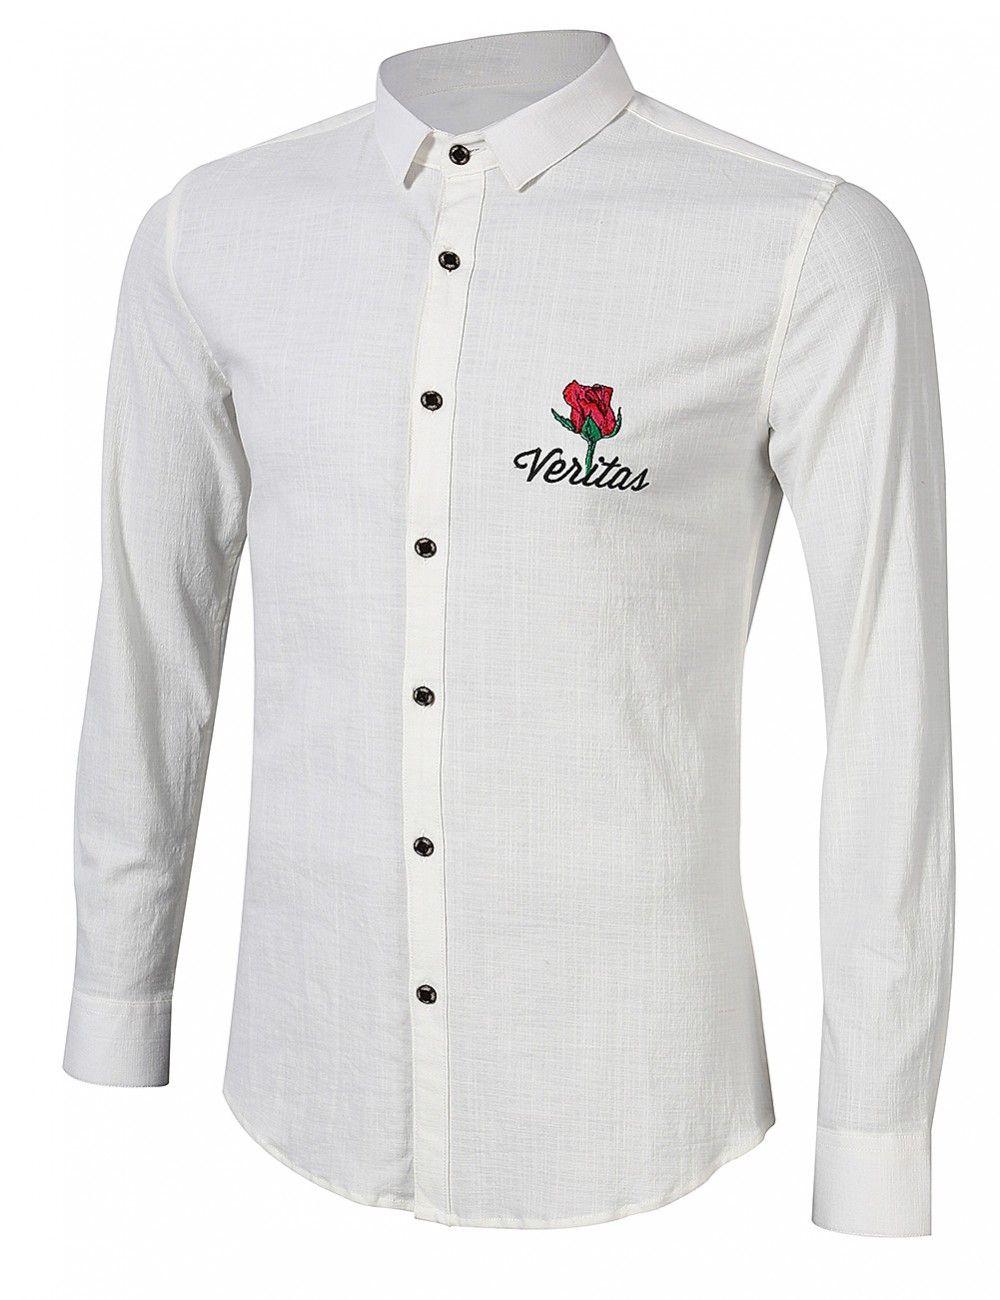 Yesfashion menus fashion rose embroidery long sleeve shirt